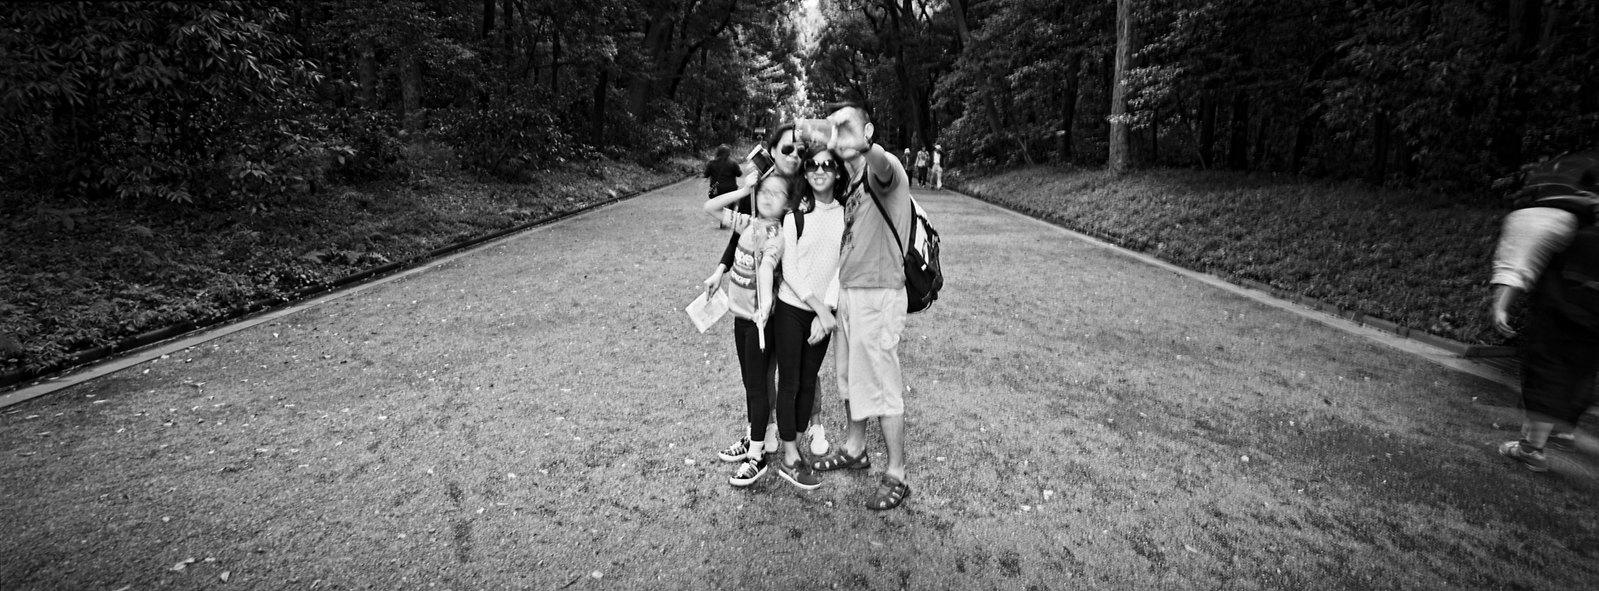 Yoyogi Group Selfie